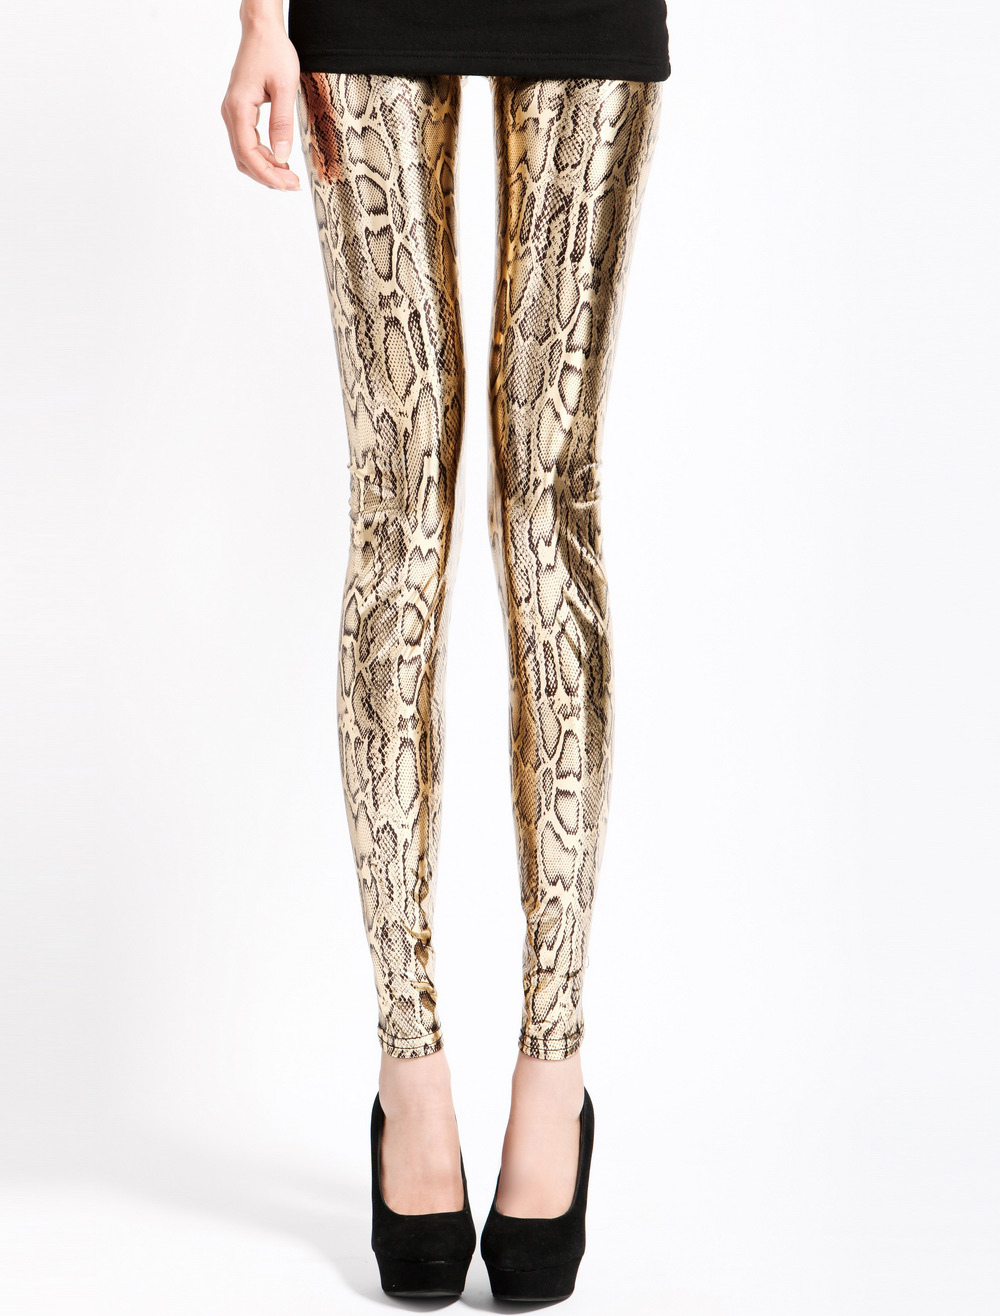 Snake Print Spandex Leggings Cheap clothes, free shipping worldwide